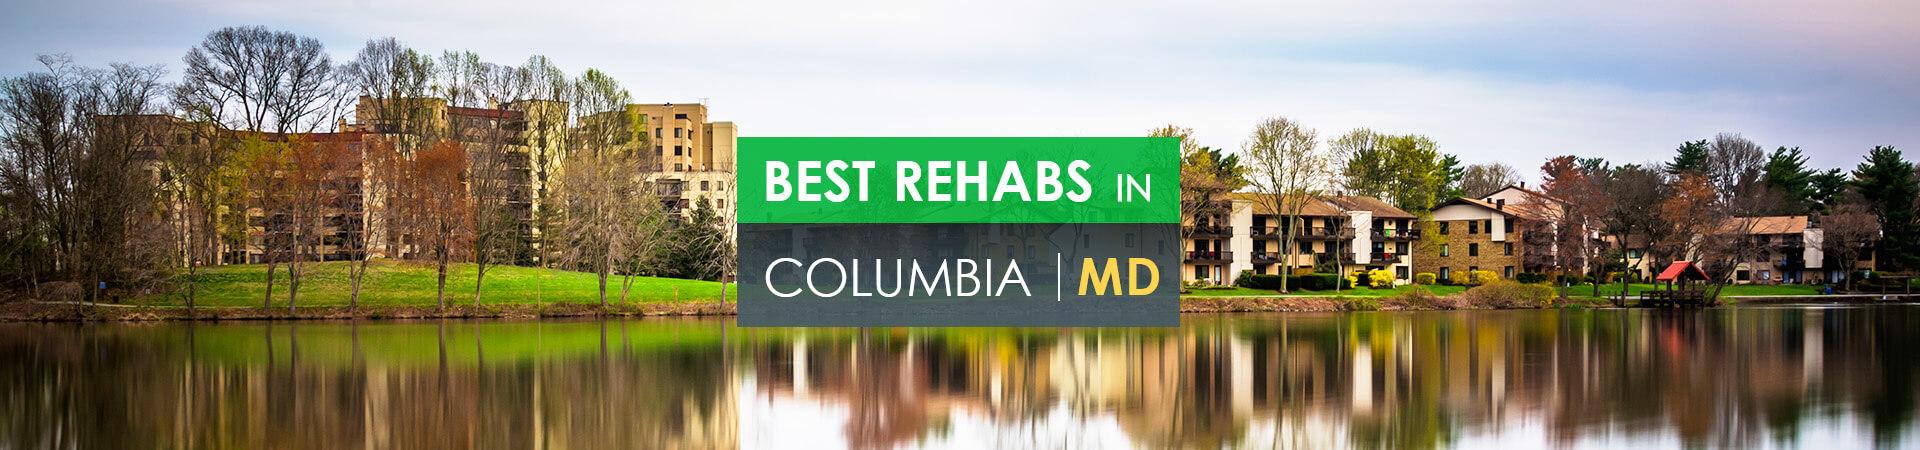 Best rehabs in Columbia, MD